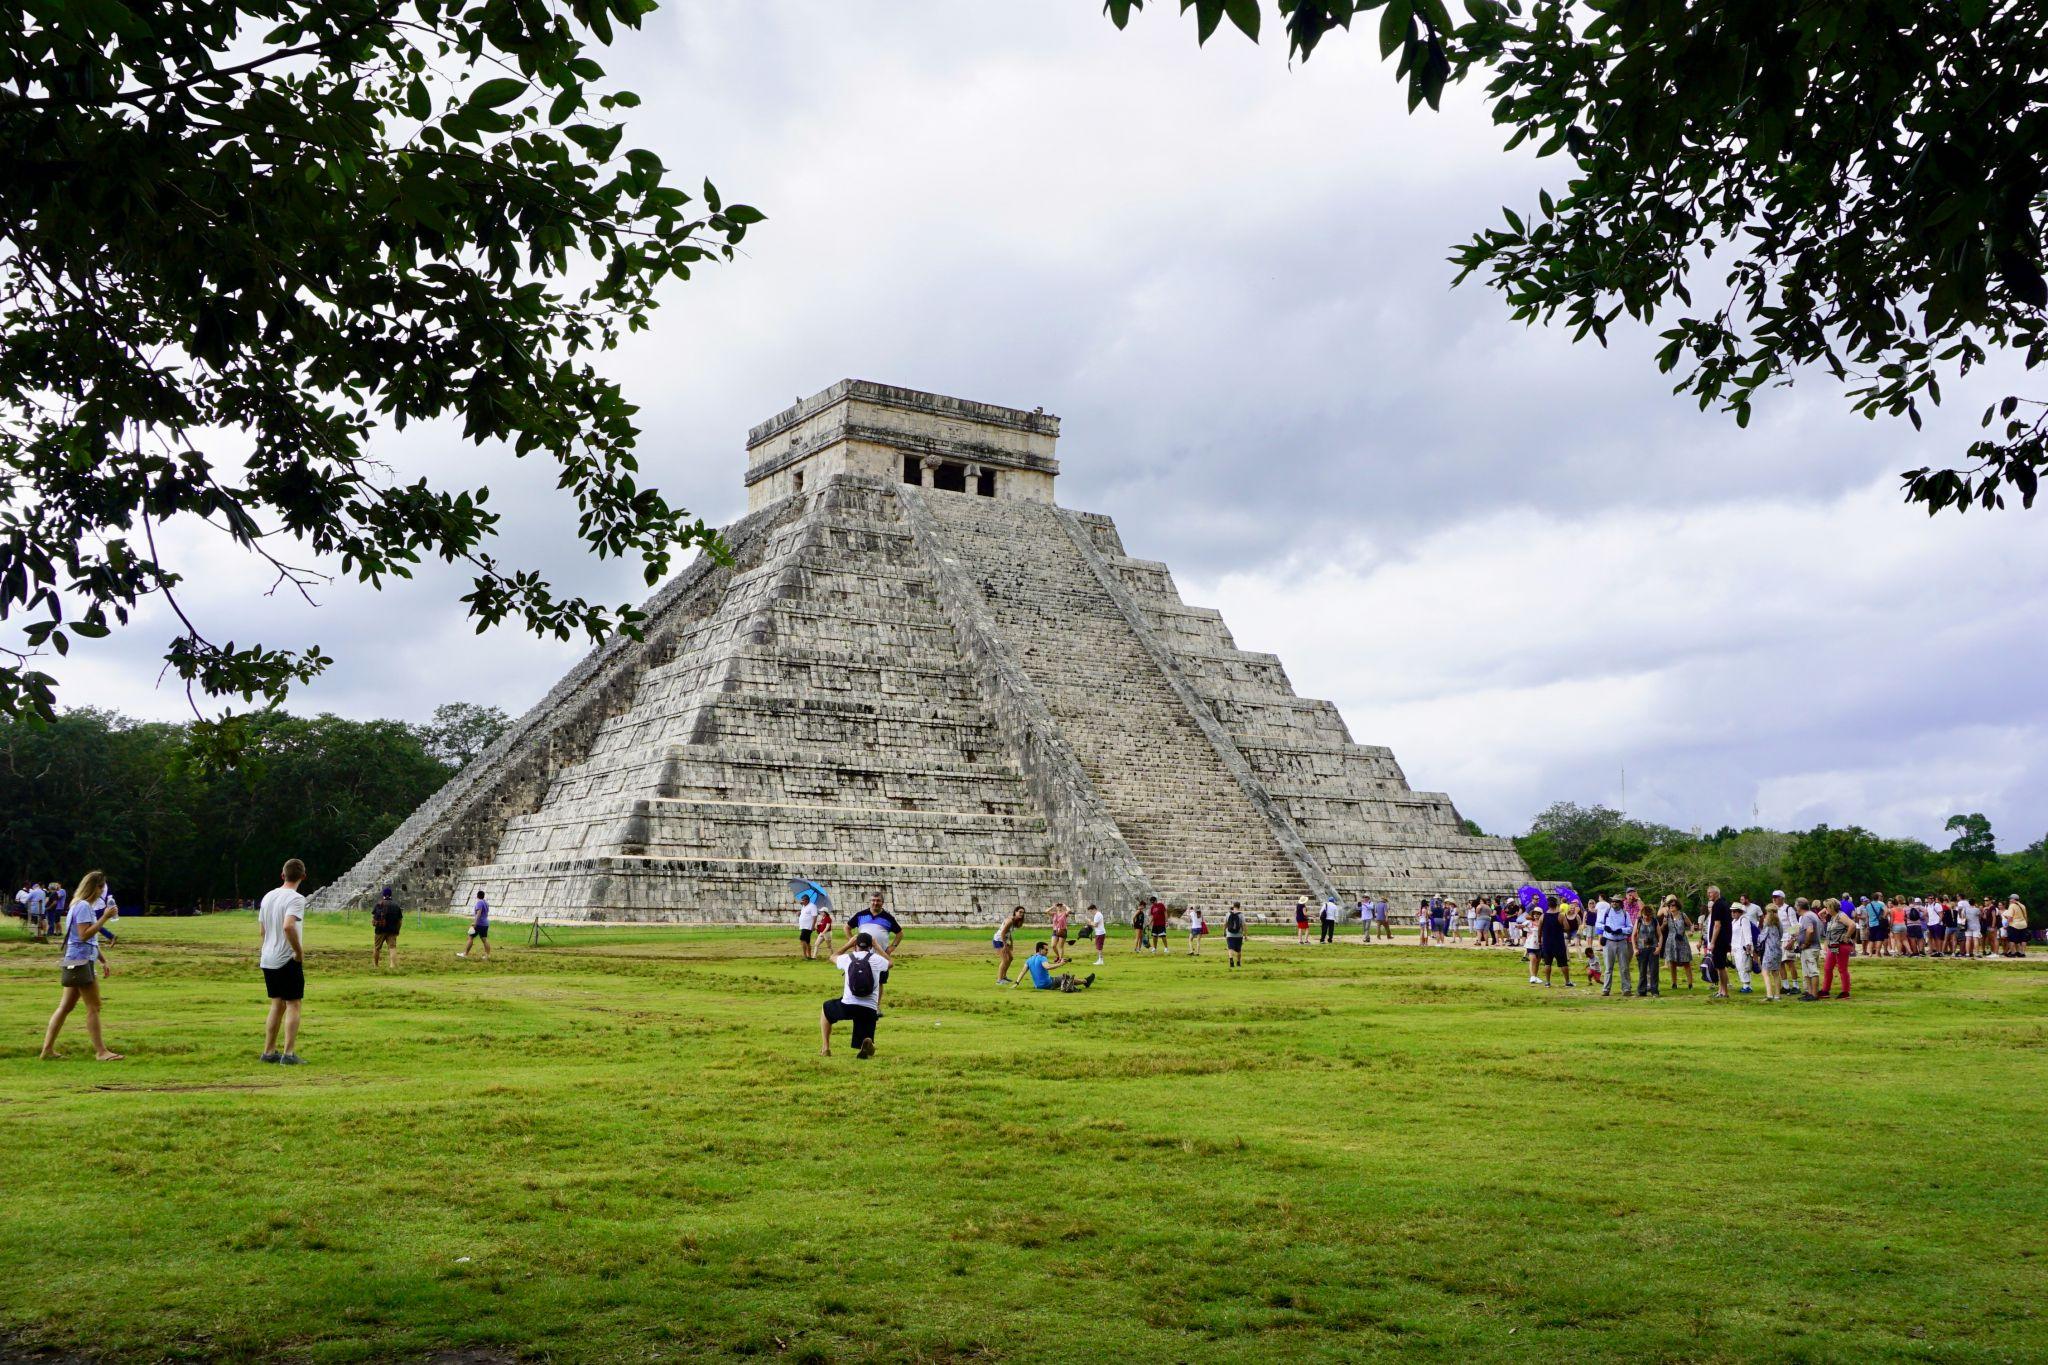 Interesting facts about El Castillo in Chichen Itzá